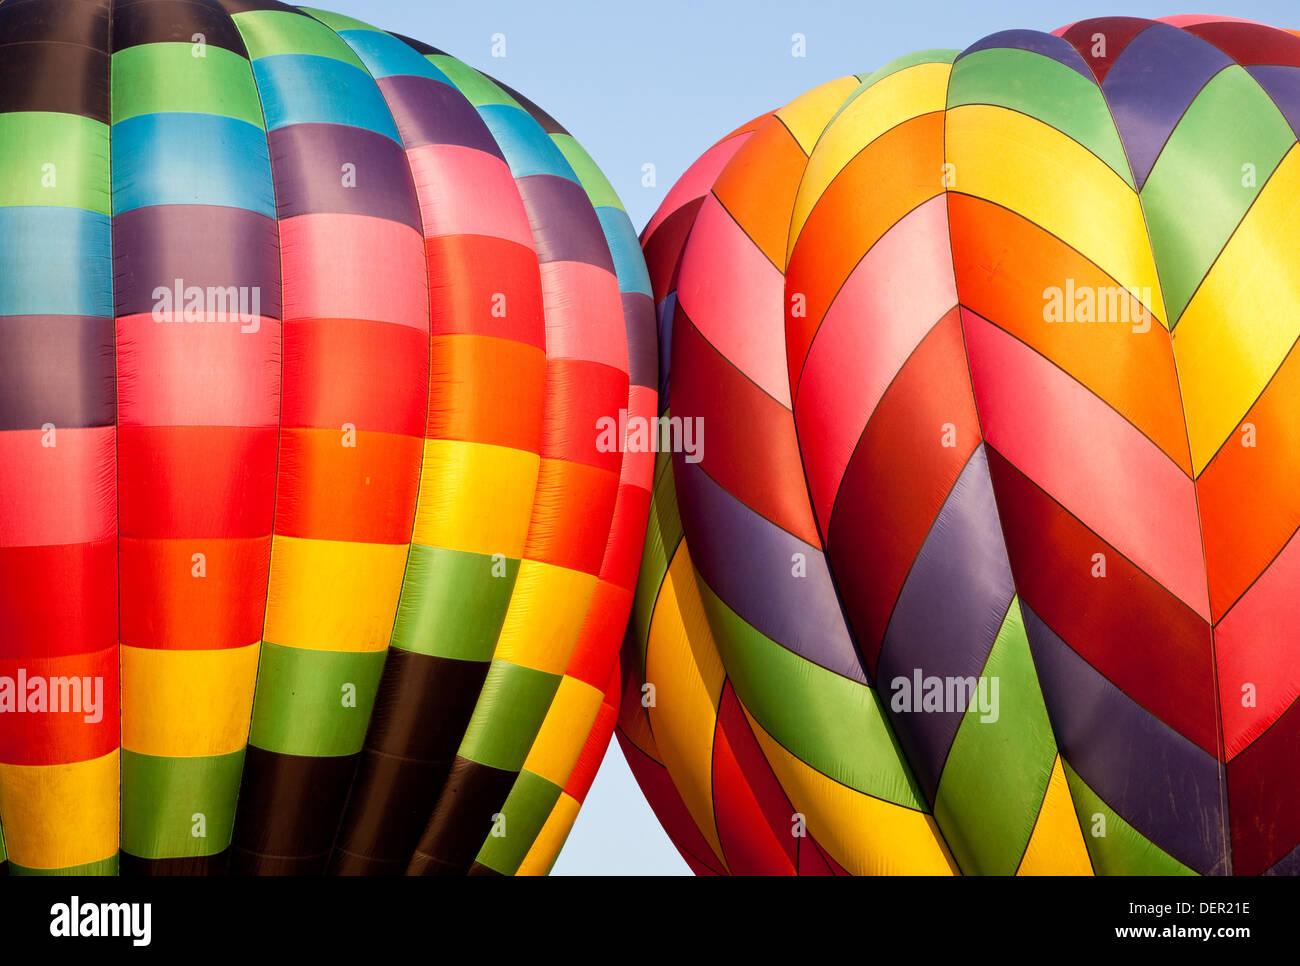 Colourful hot air balloon - Stock Image